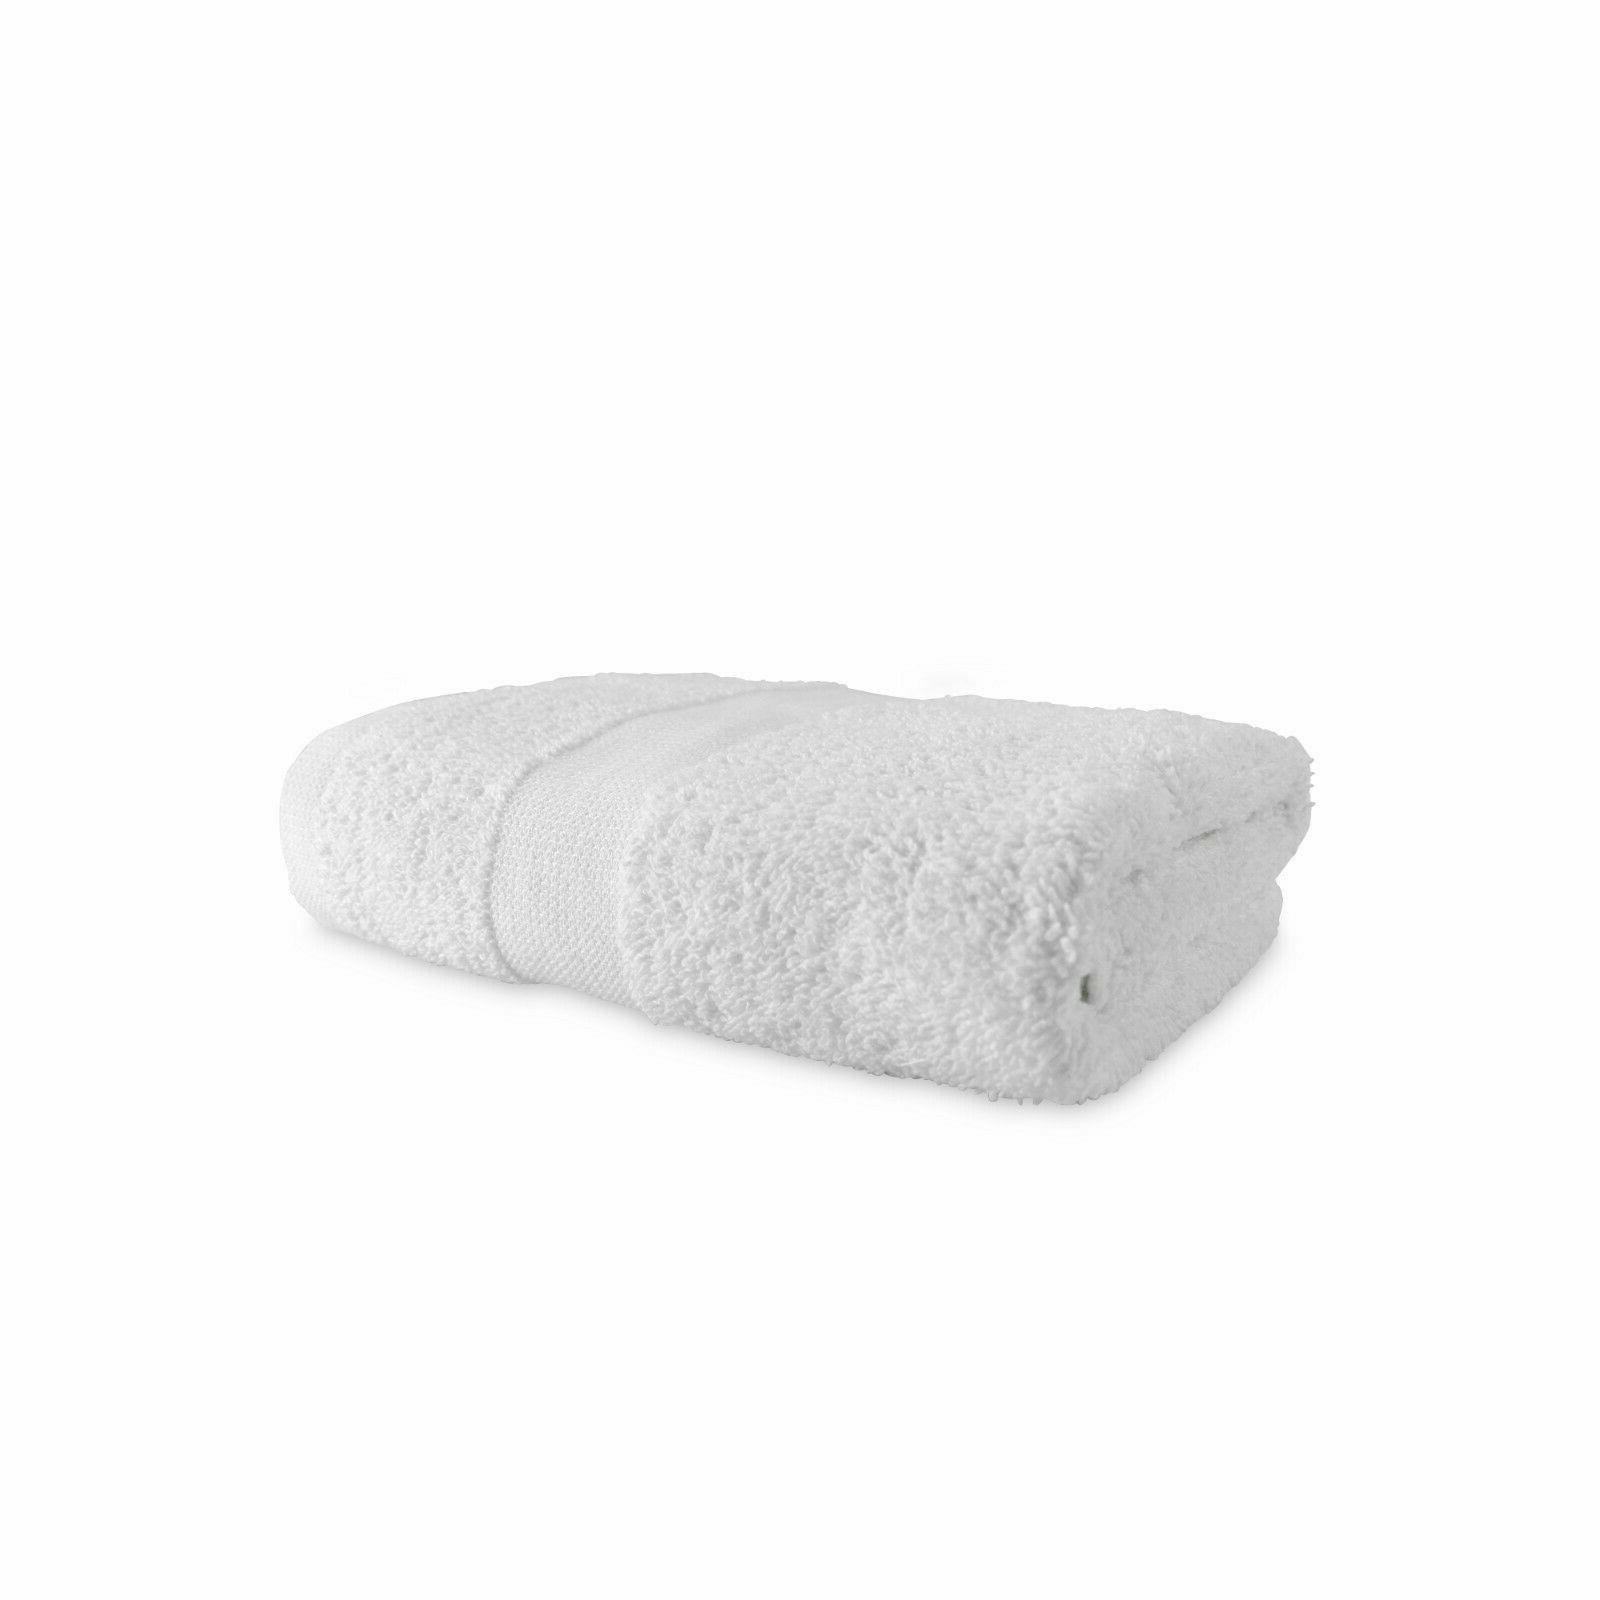 Case 120 Hand Towels - Multi-Purpose Bathroom Wholesale